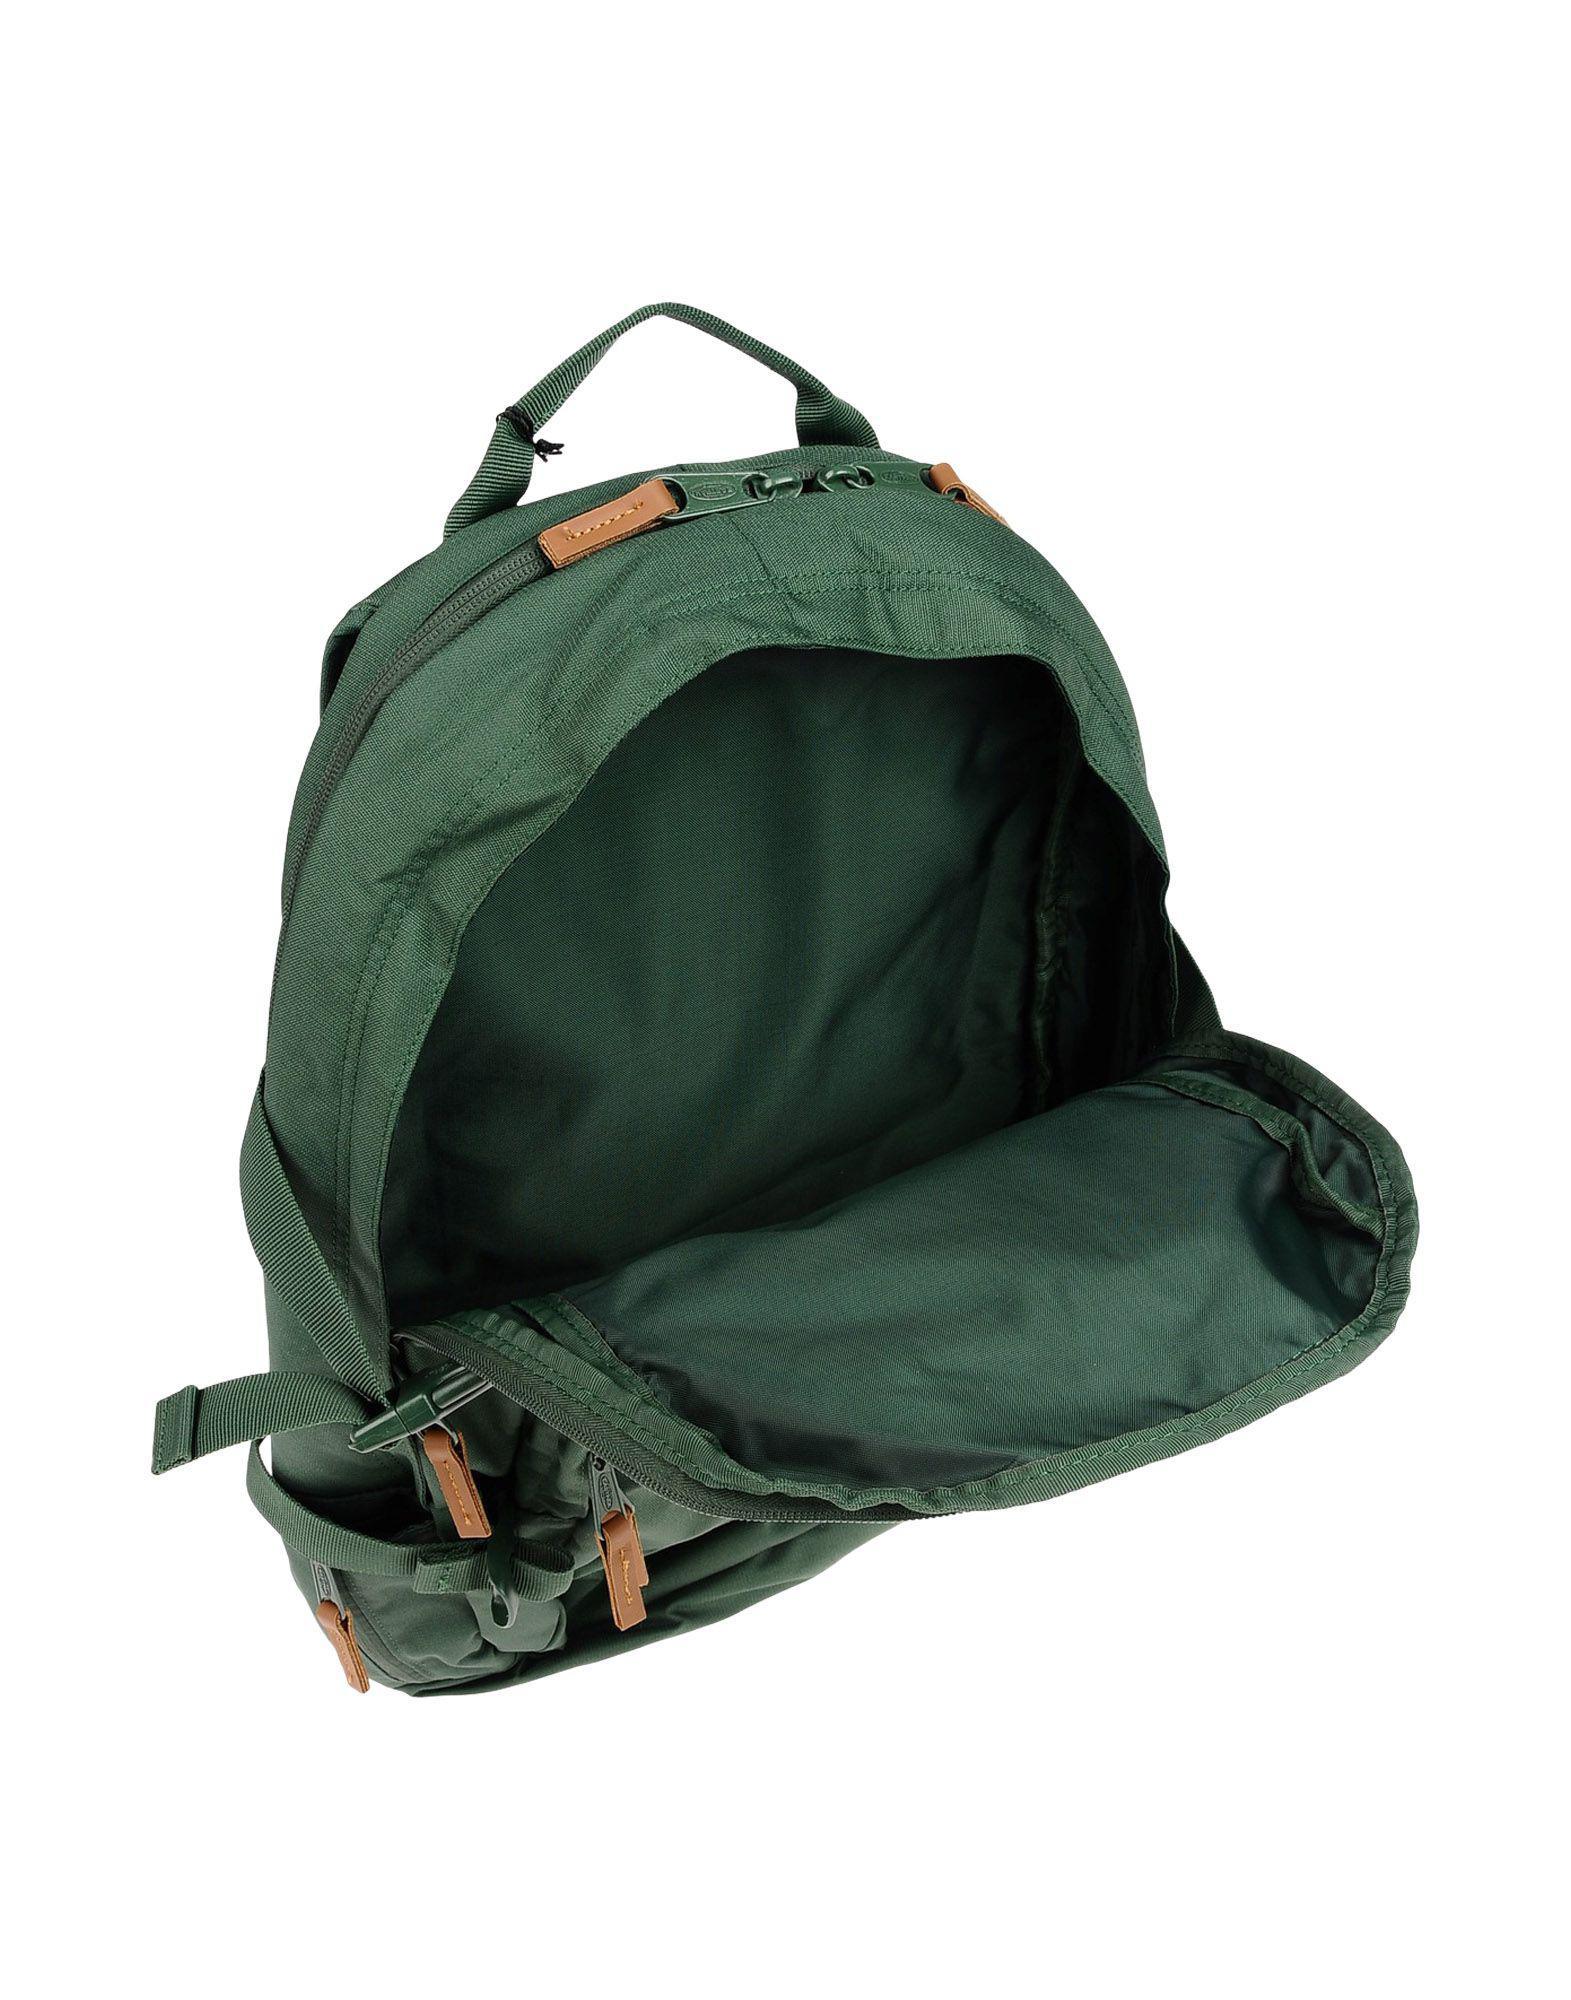 Eastpak Canvas Backpacks & Fanny Packs in Green